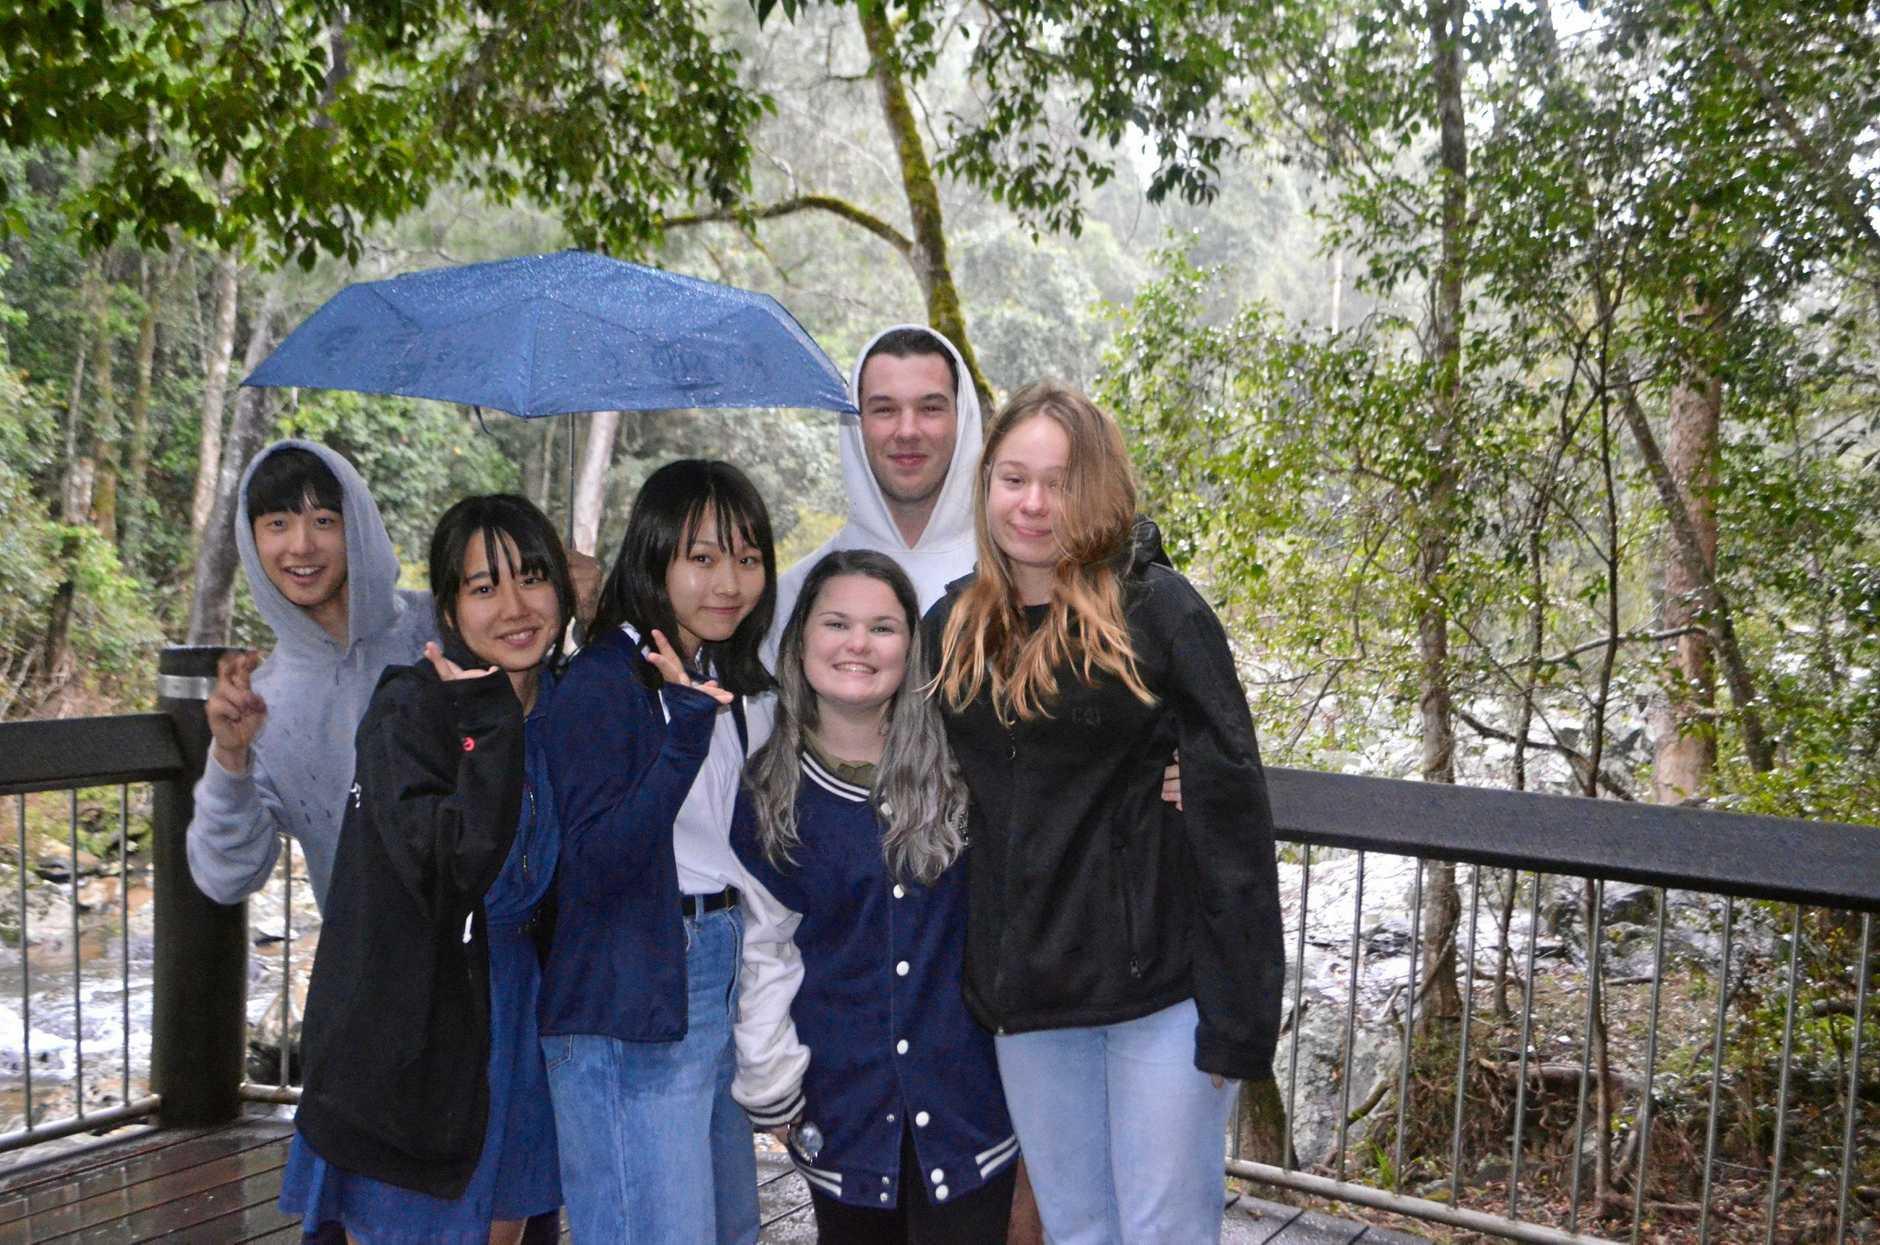 BUSH FUN: Yujin Sasaki, Iwasa Momo, Ai Enomoto, Shinae McEvoy, Pacey Webb and Lainey Cornwall.